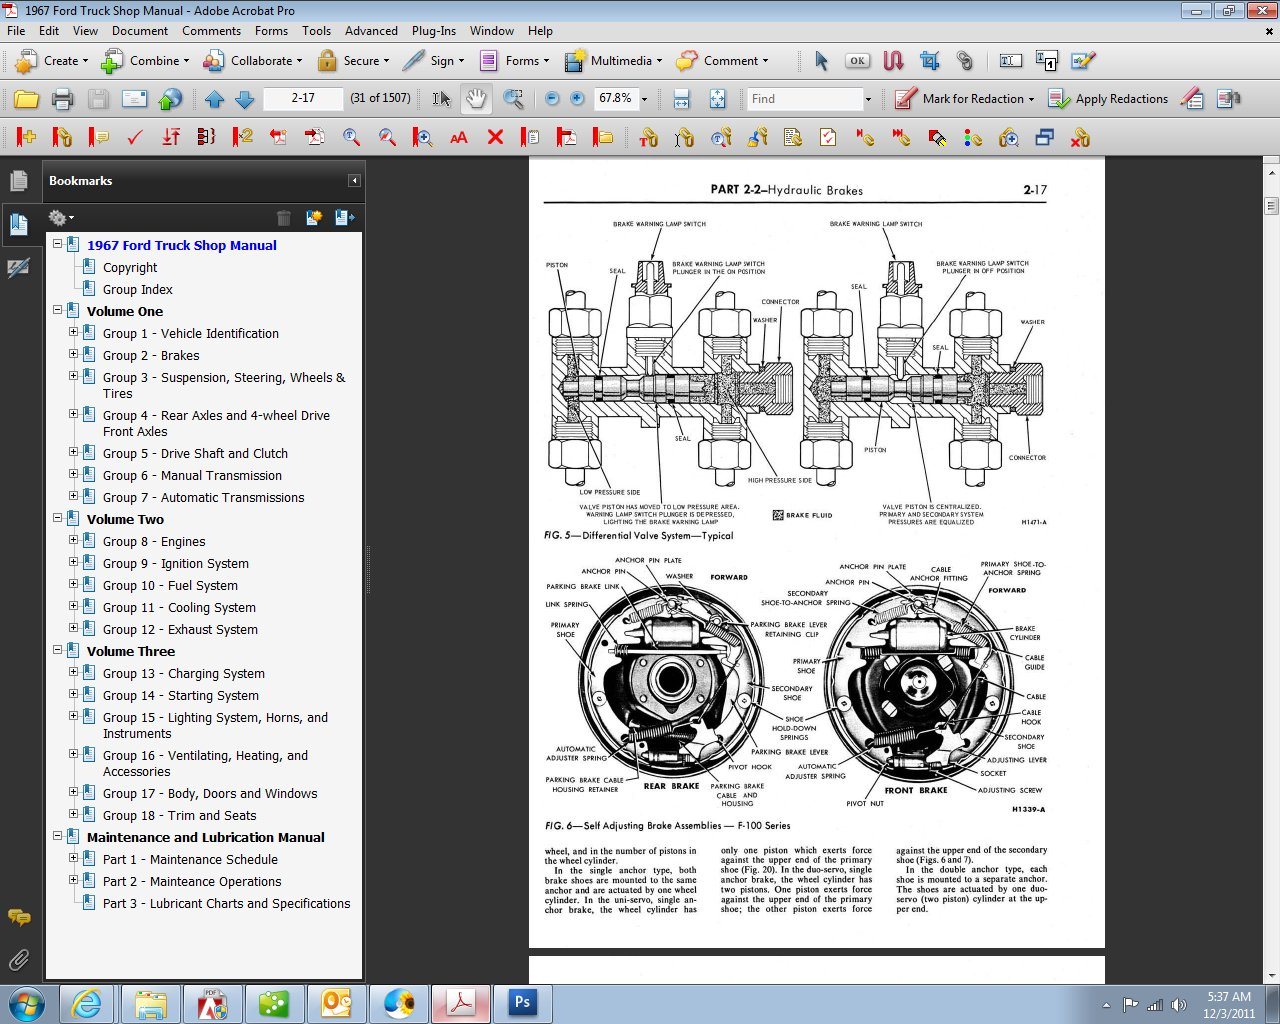 1967 Ford Truck Shop Manual Motor Company David E Leblanc F750 7 Pin Wiring Diagram 9781603710756 Books